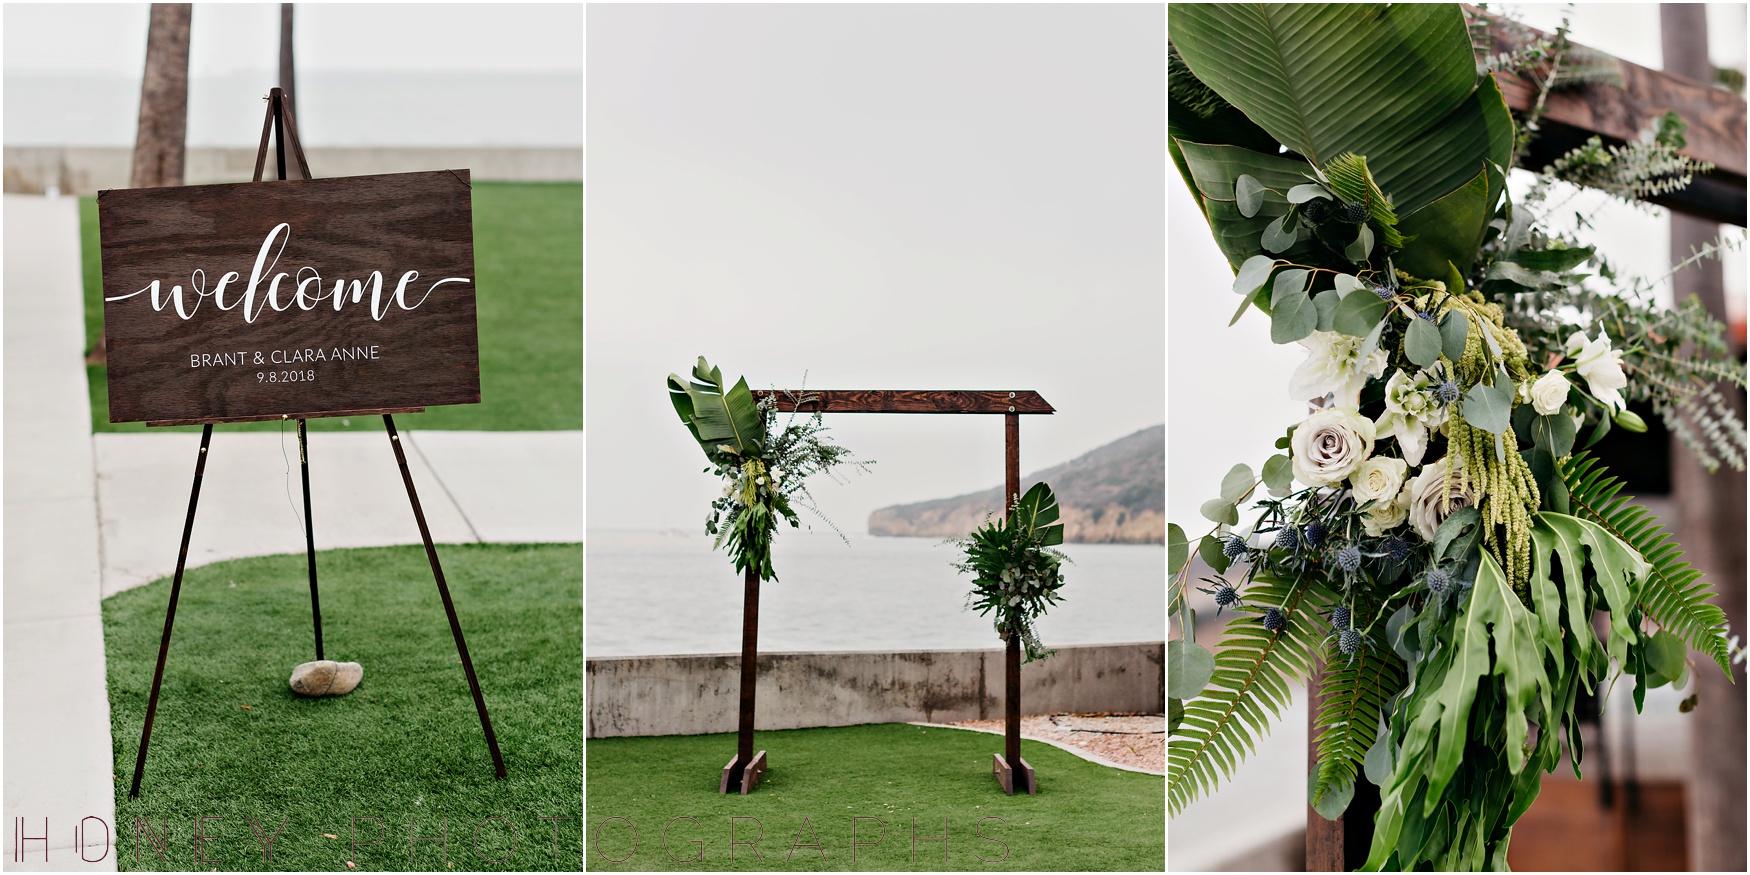 oceanview_point_loma_tropical_beach_ocean_wedding027.jpg